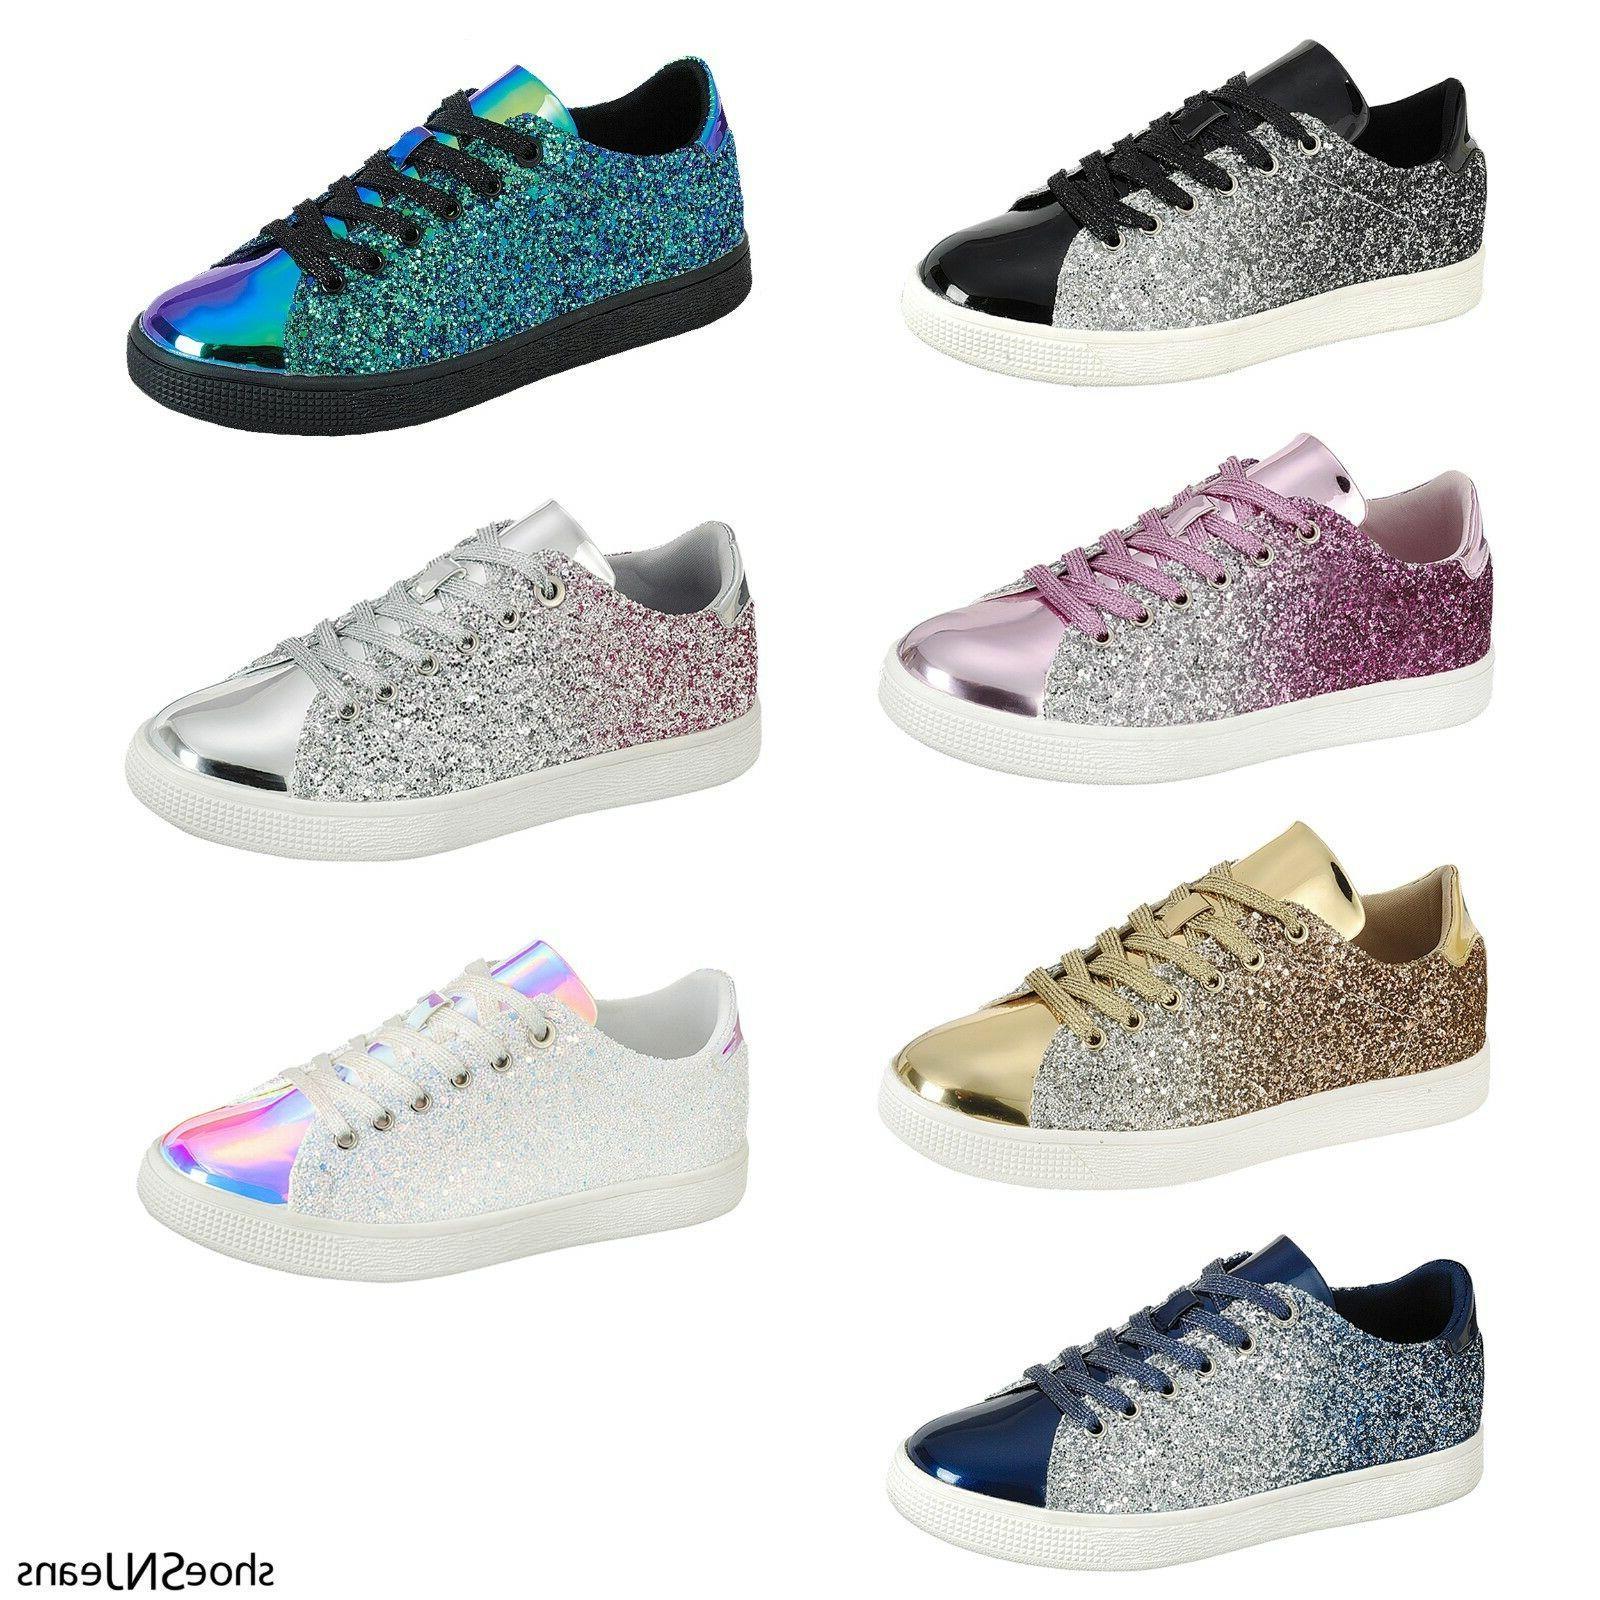 new women sequin glitter sneakers athletic tennis